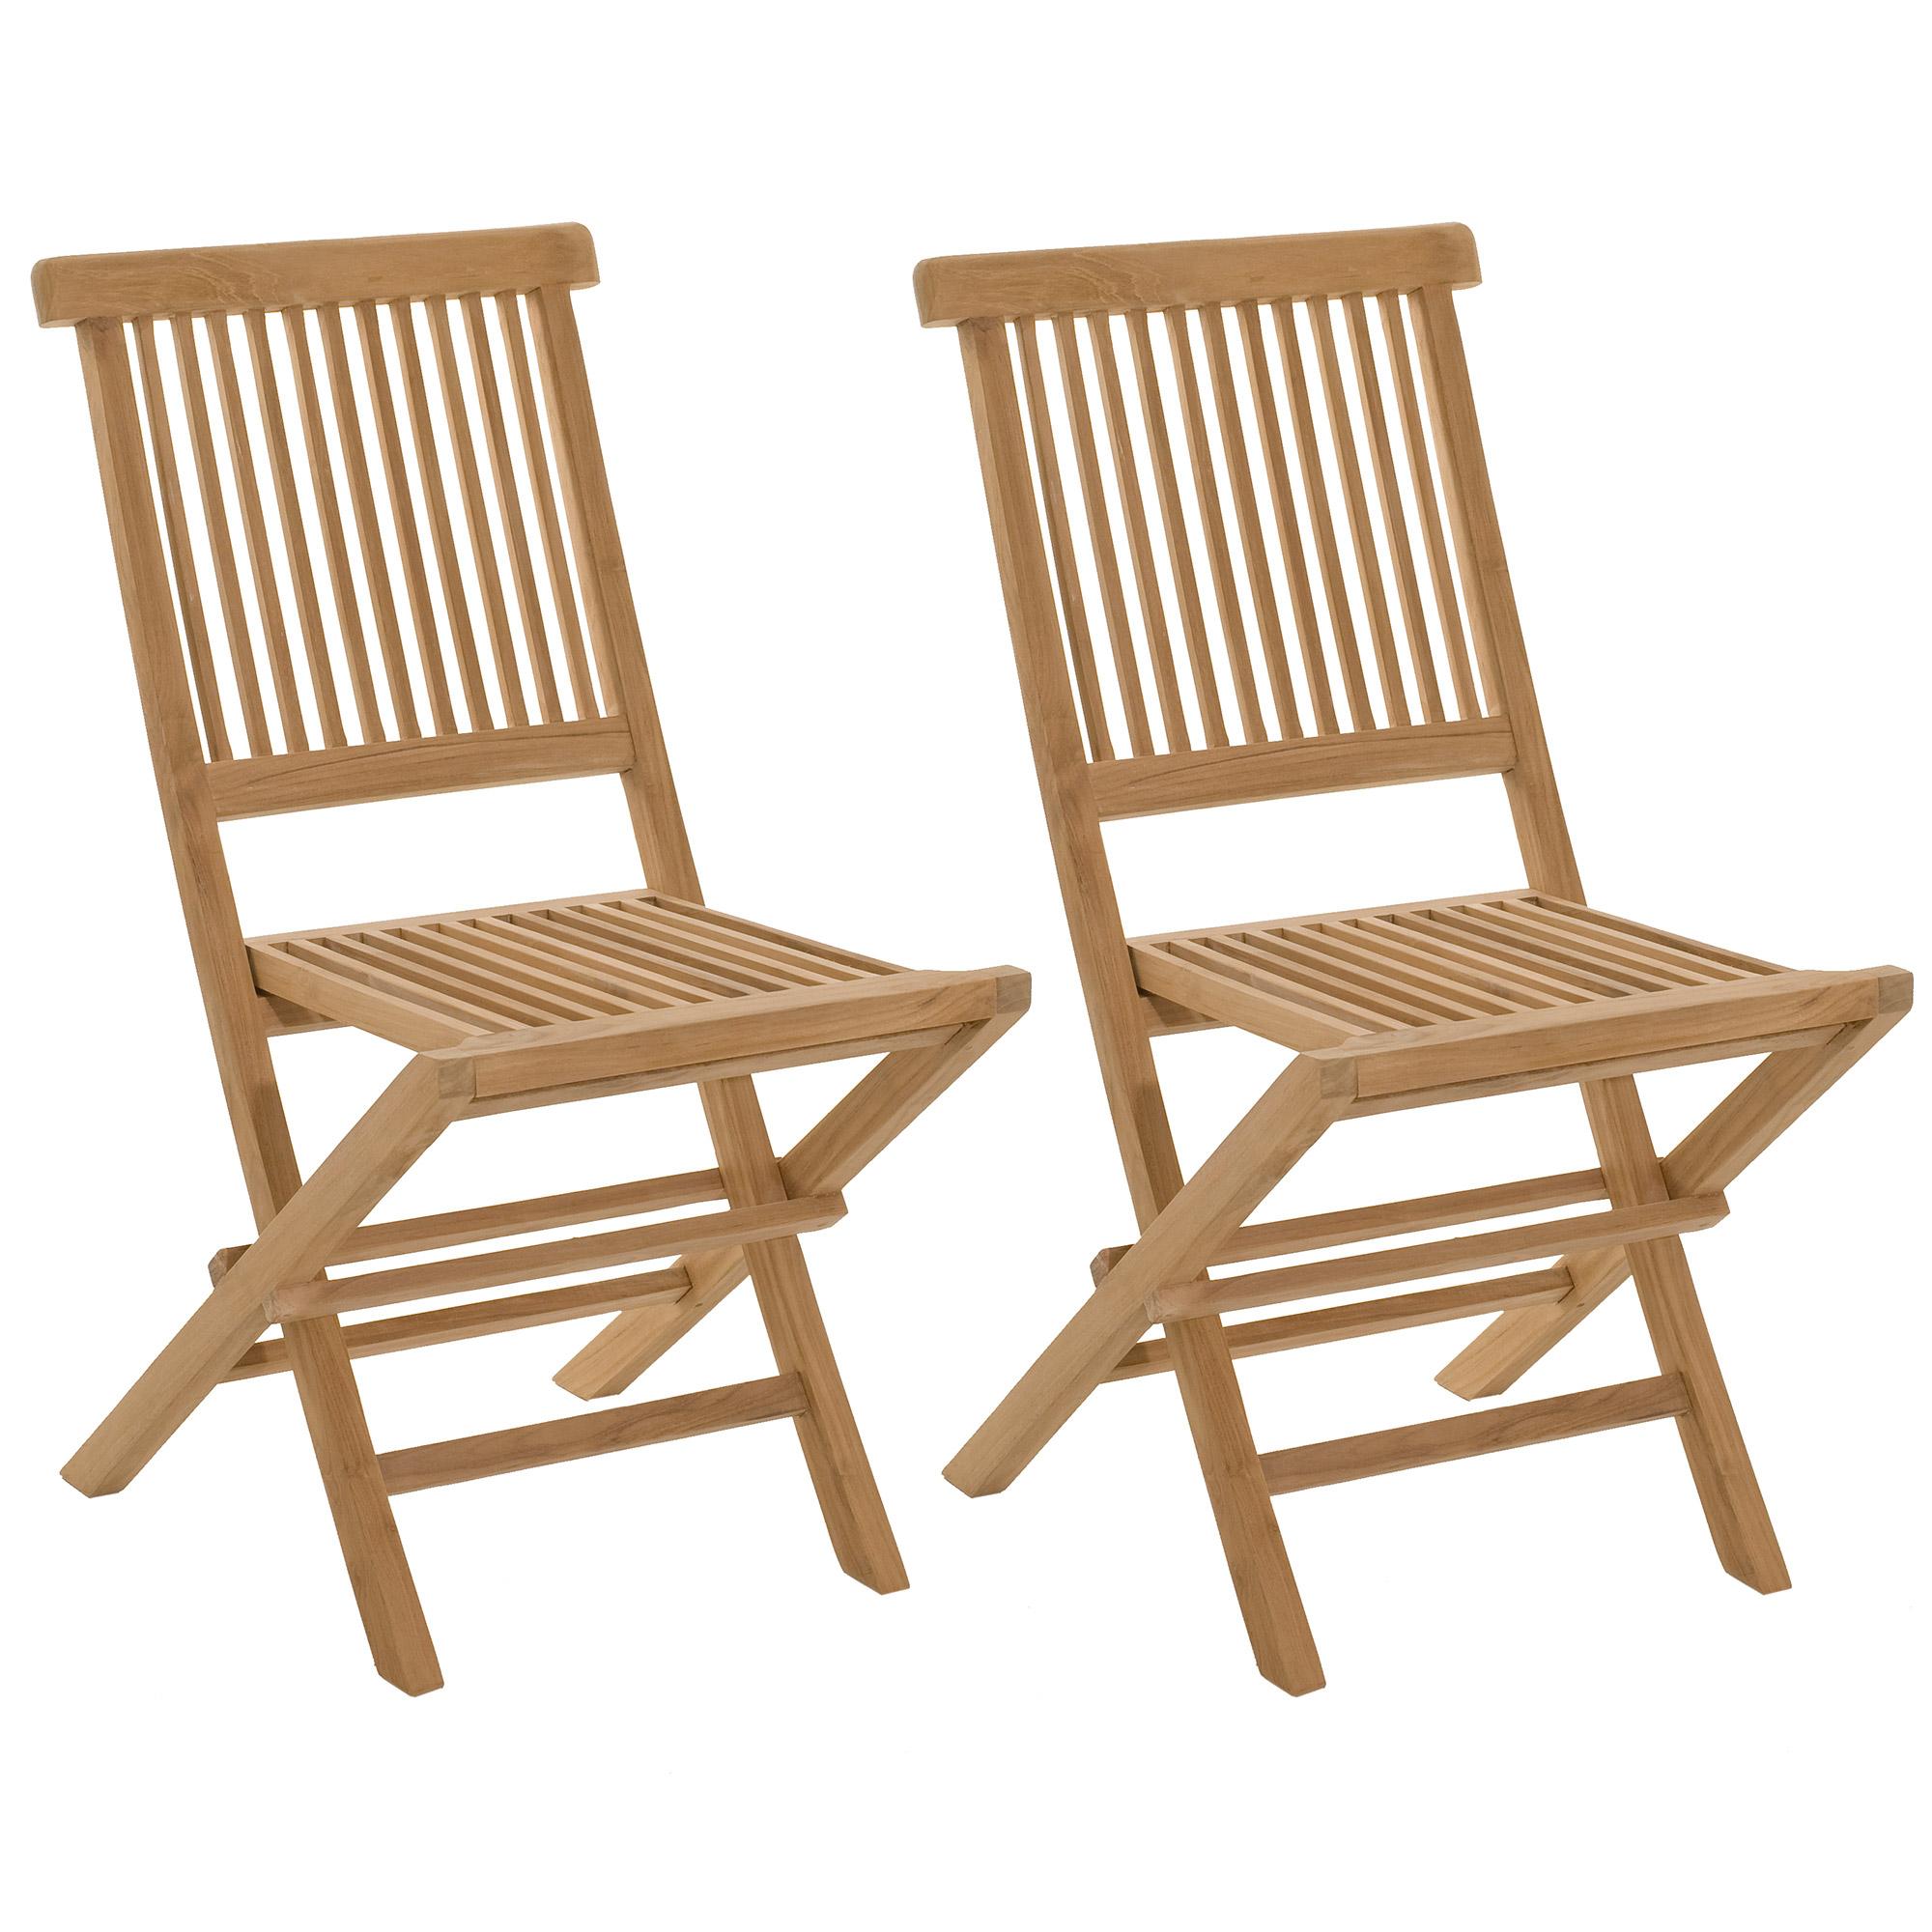 Lot de 2 chaises pliantes en teck massif - GARDENA